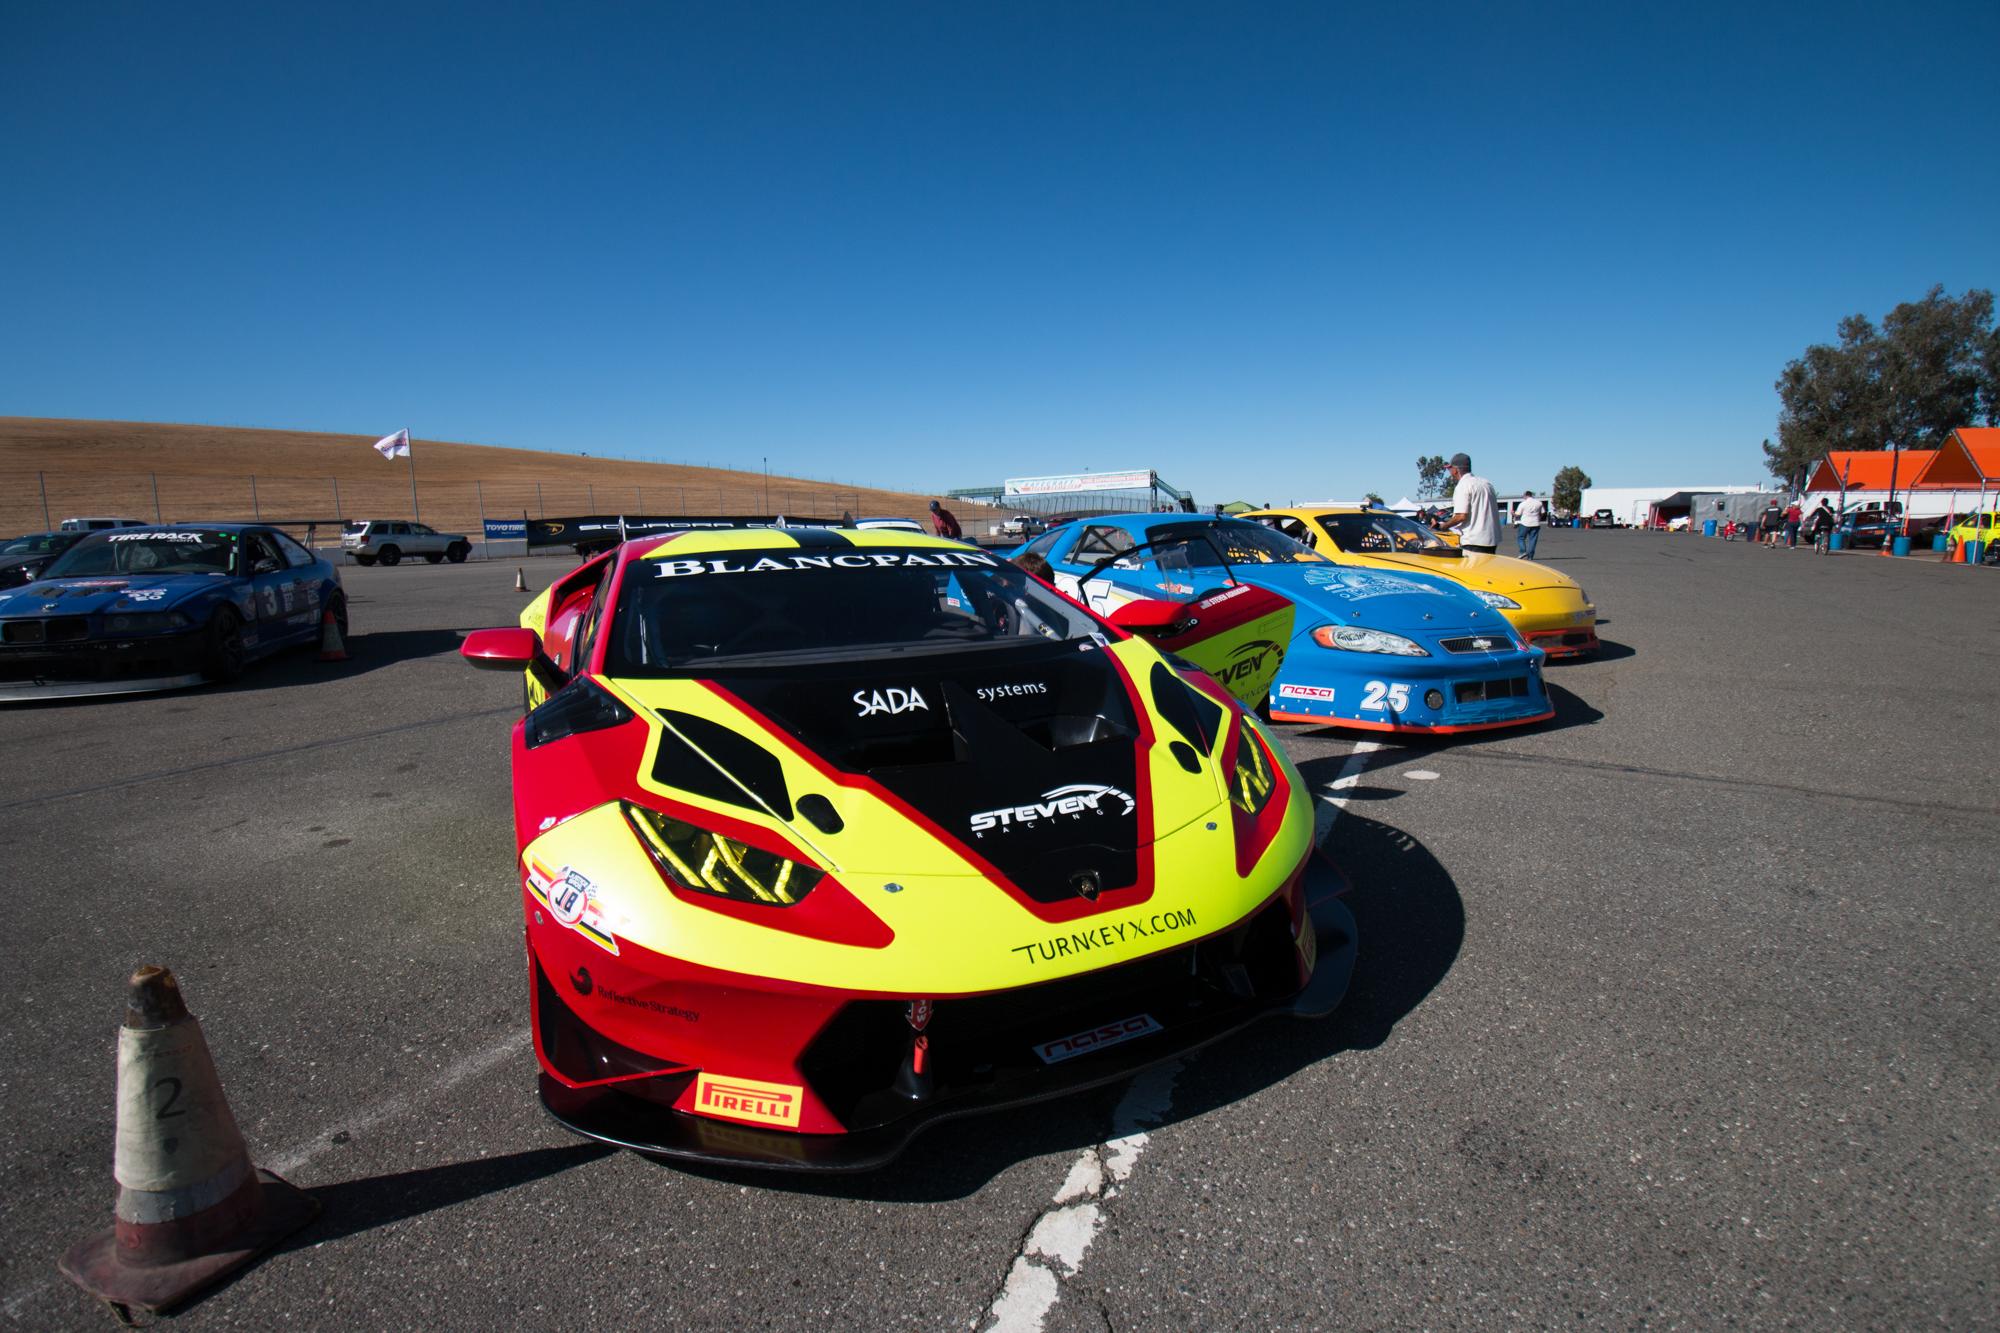 Steven-Racing-20130206-44812.jpg